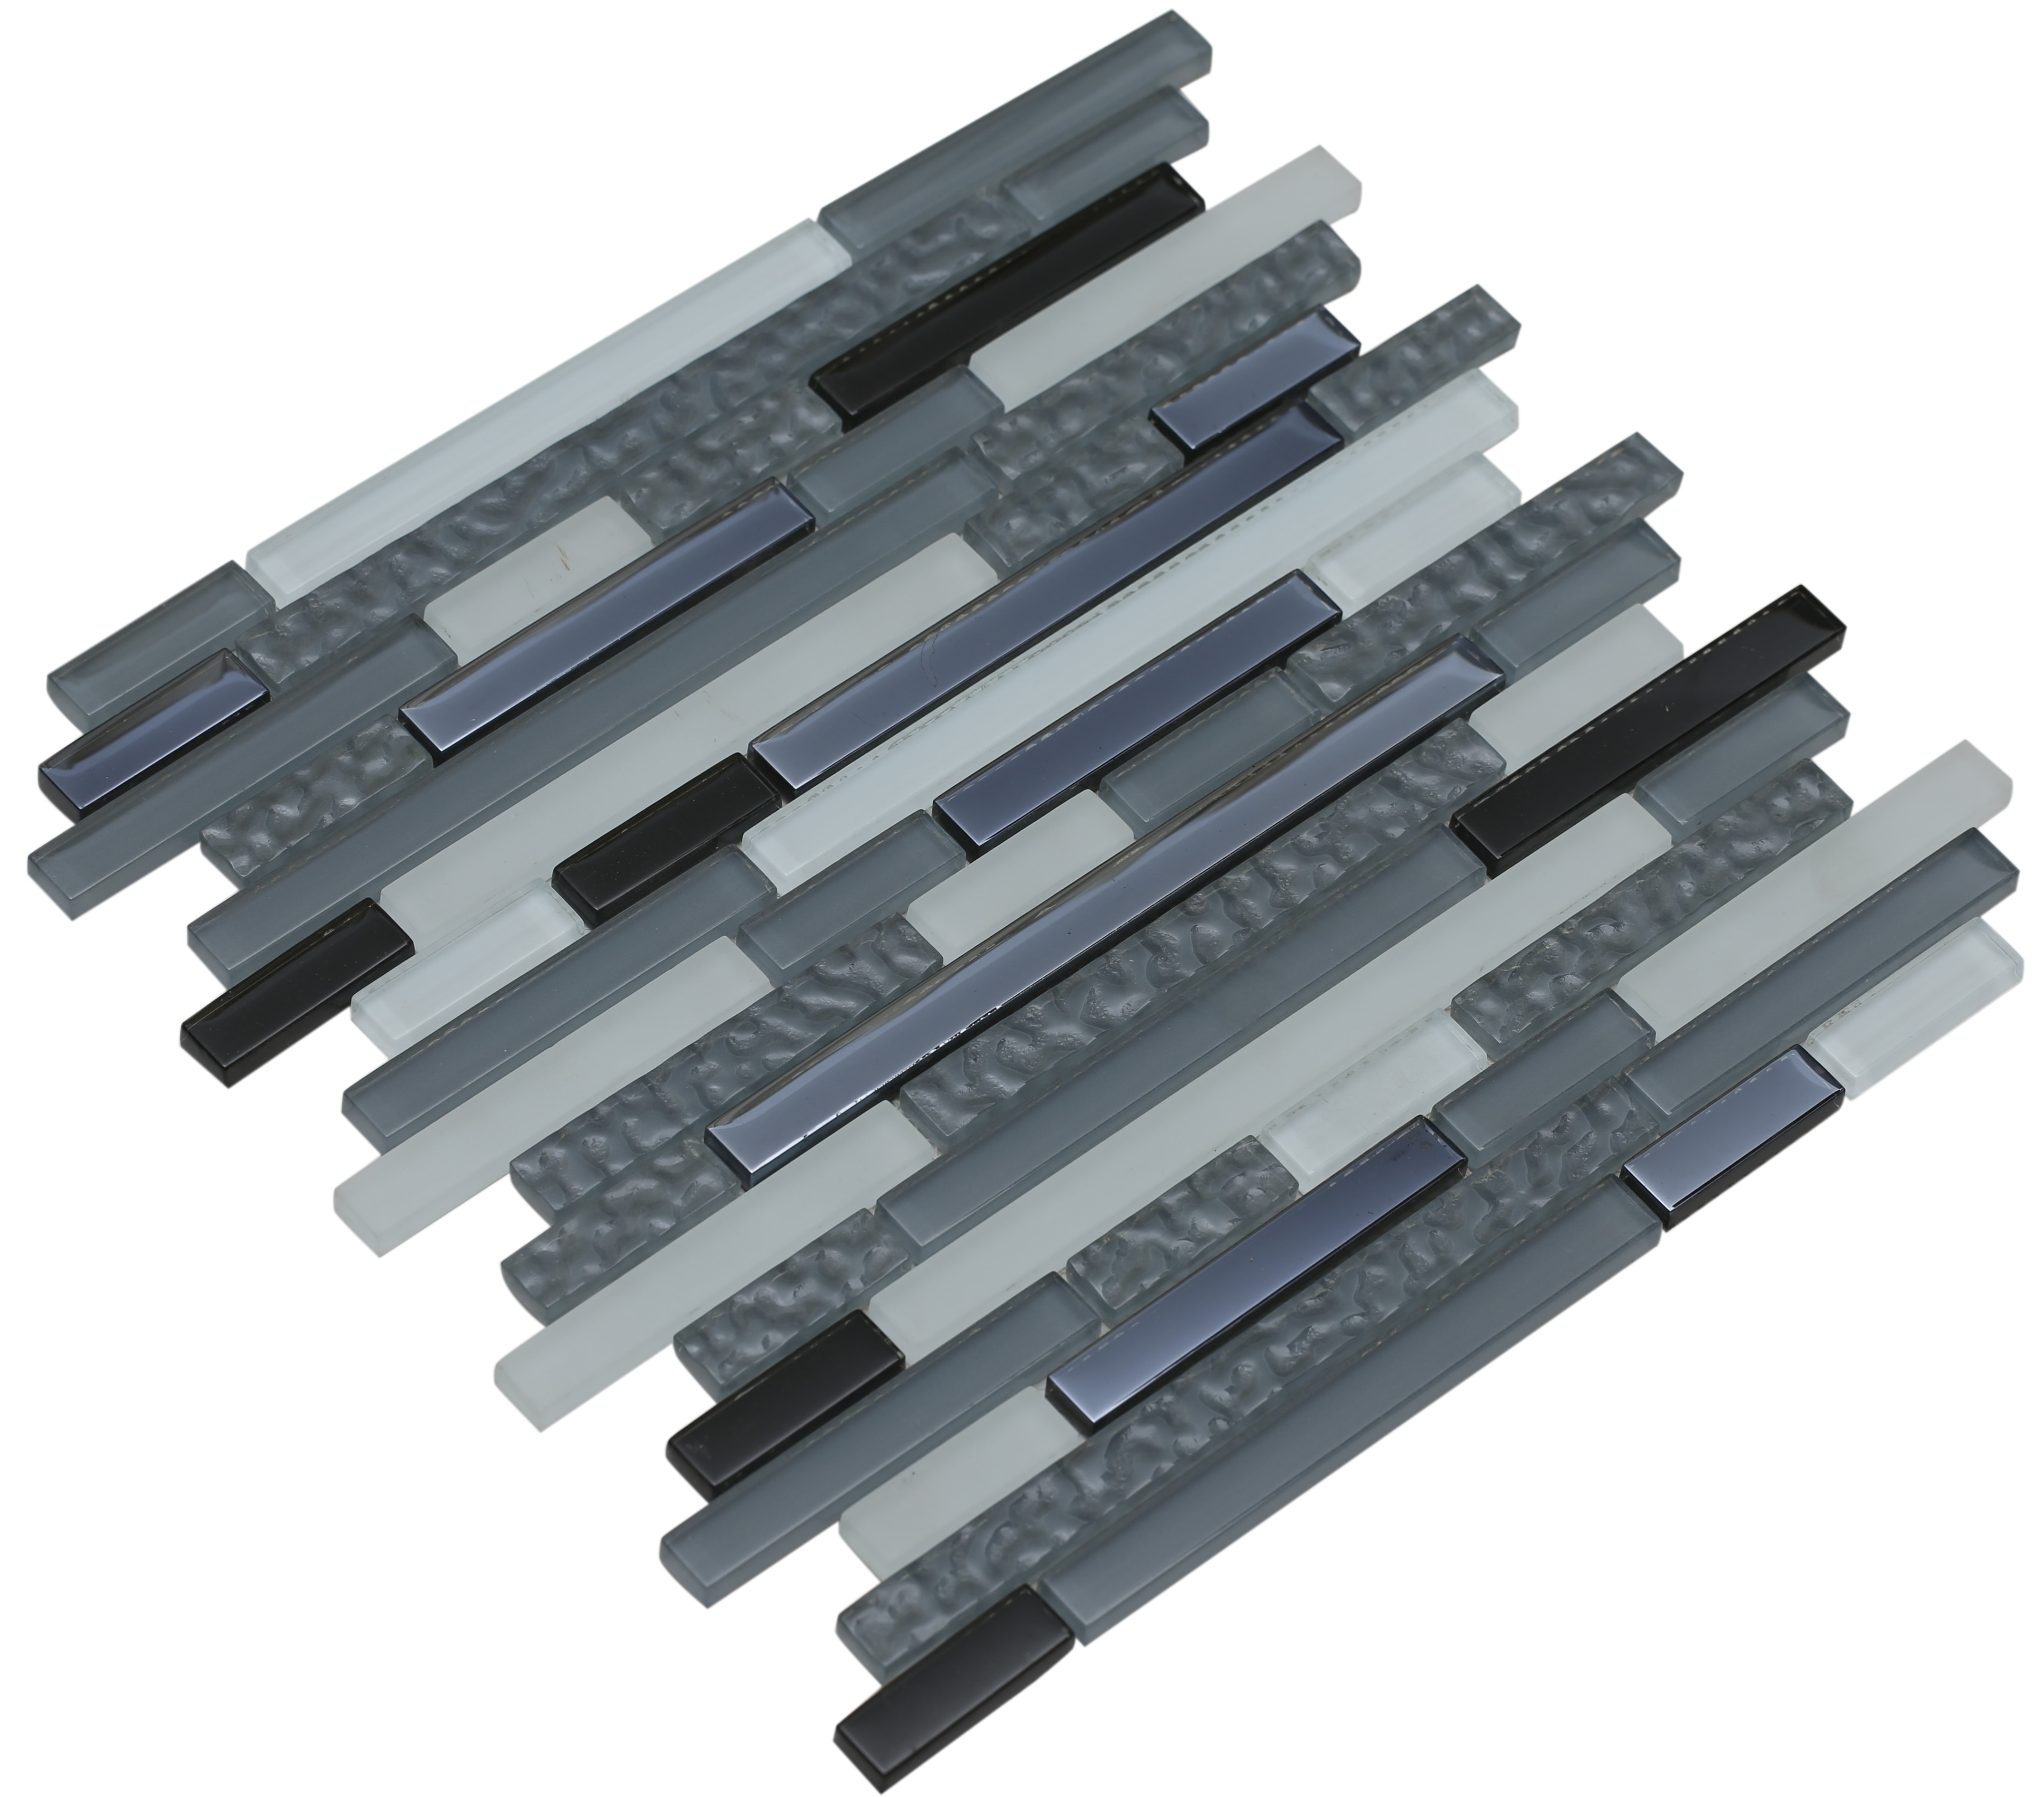 Light gray and alice blue matte, shiny black, and shiny textured light gray glass / Interlocking Fara Series 0